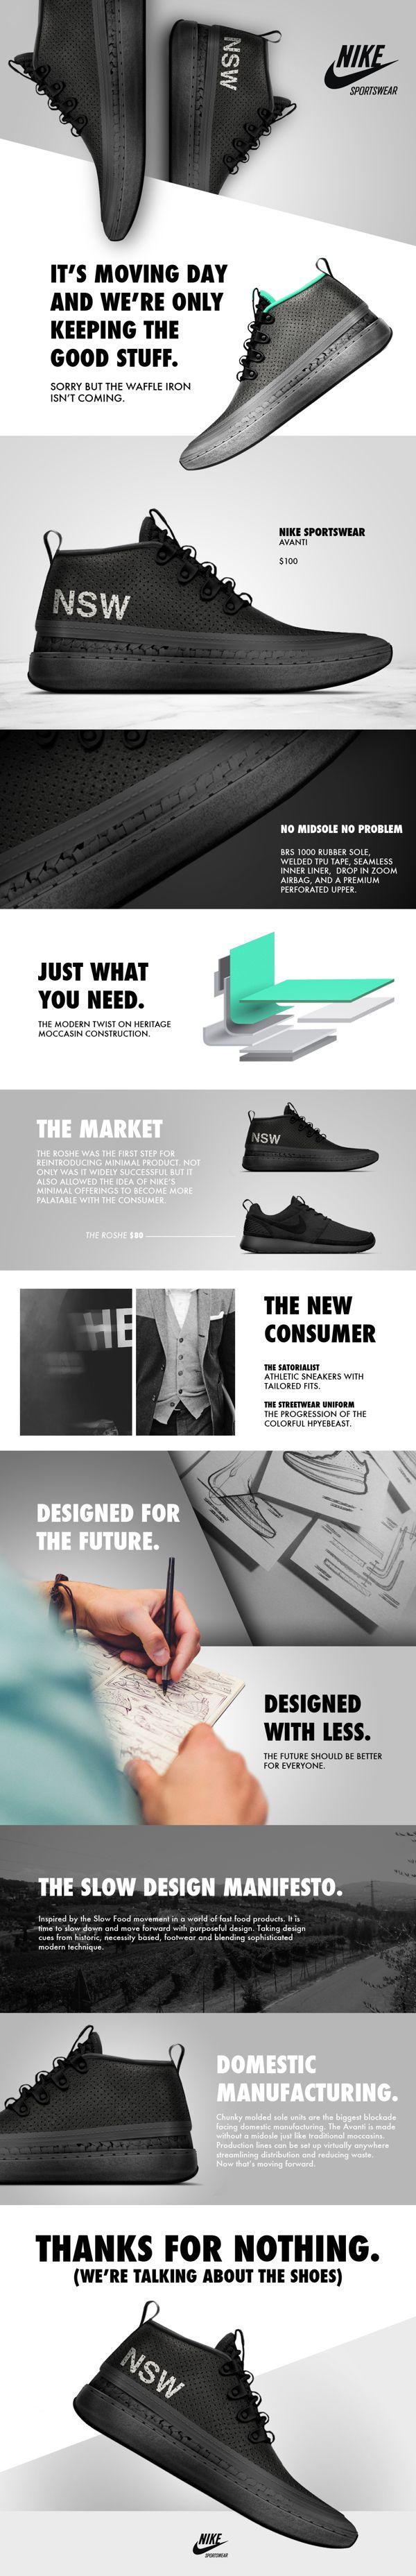 Nike footwear - like the use of angles to create depth